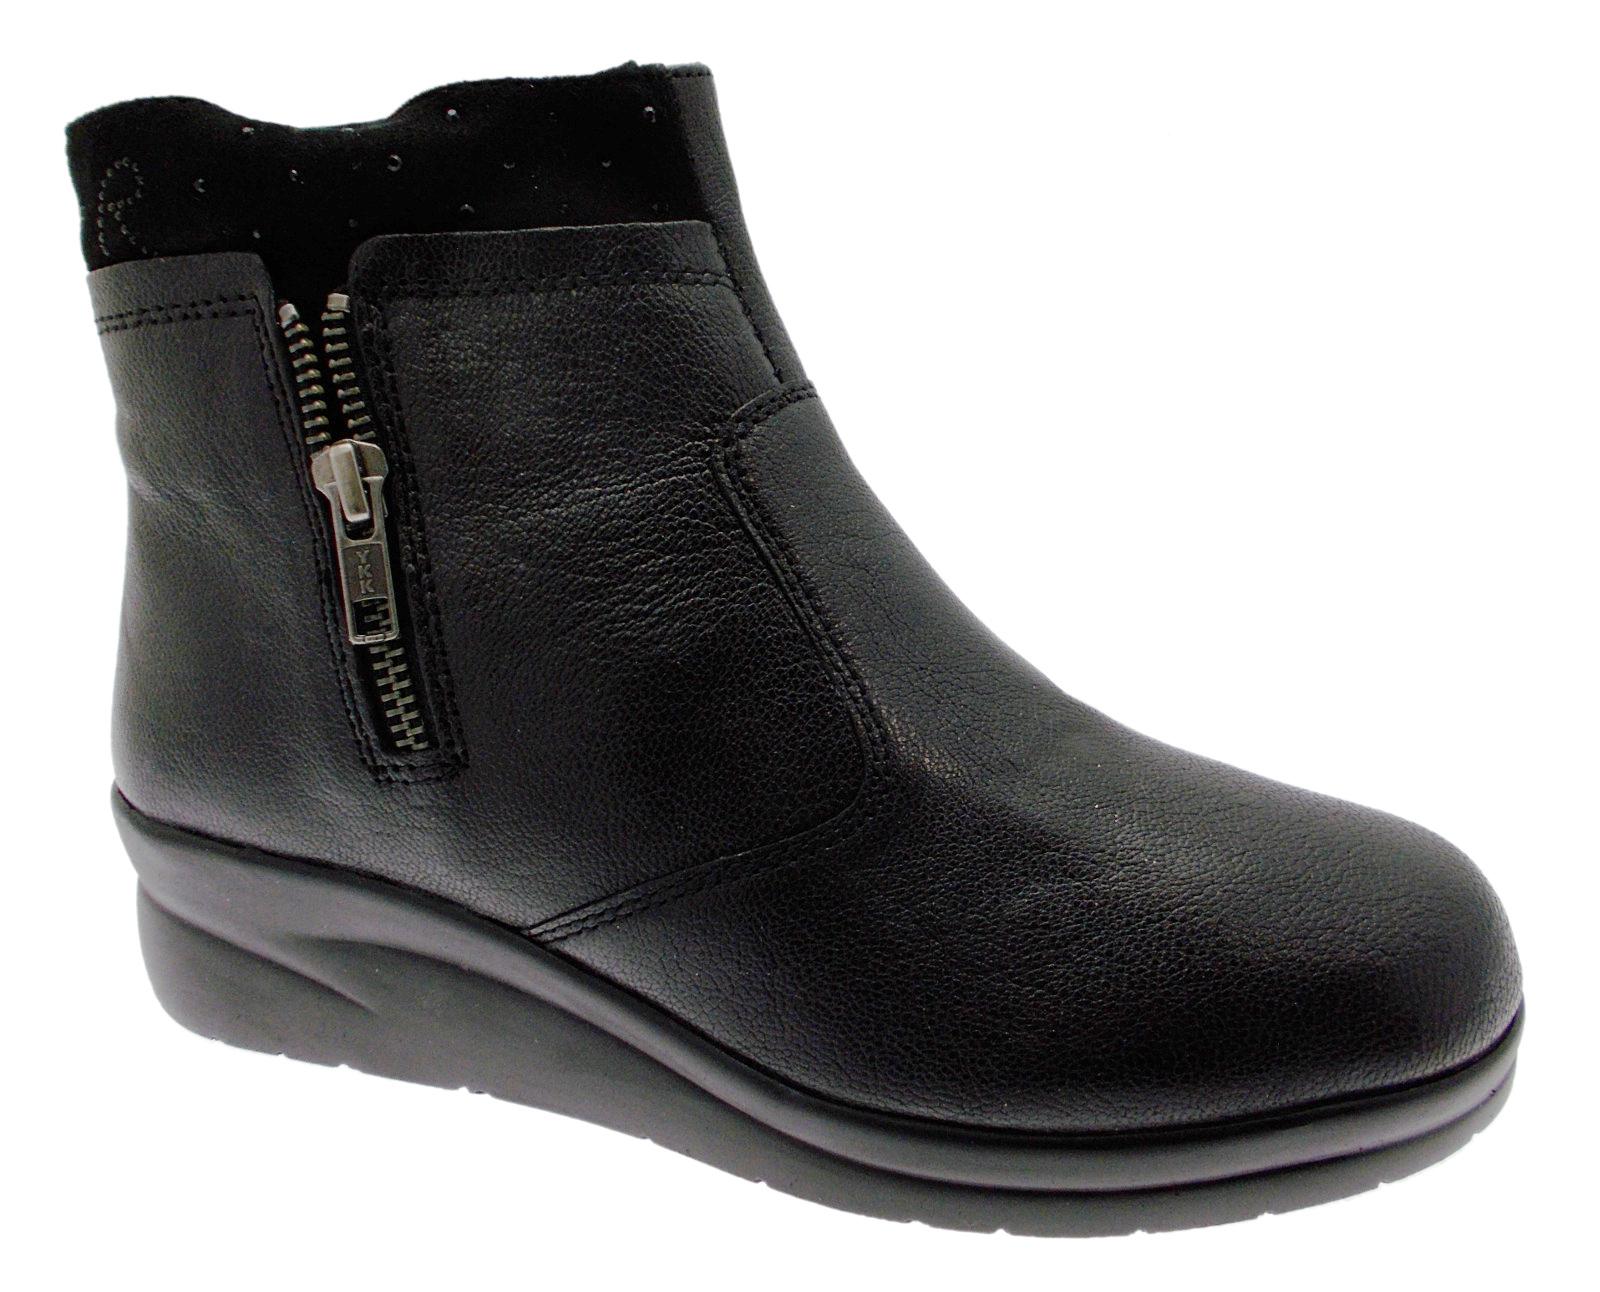 75906 black boots boot ancke boot woman Riposella